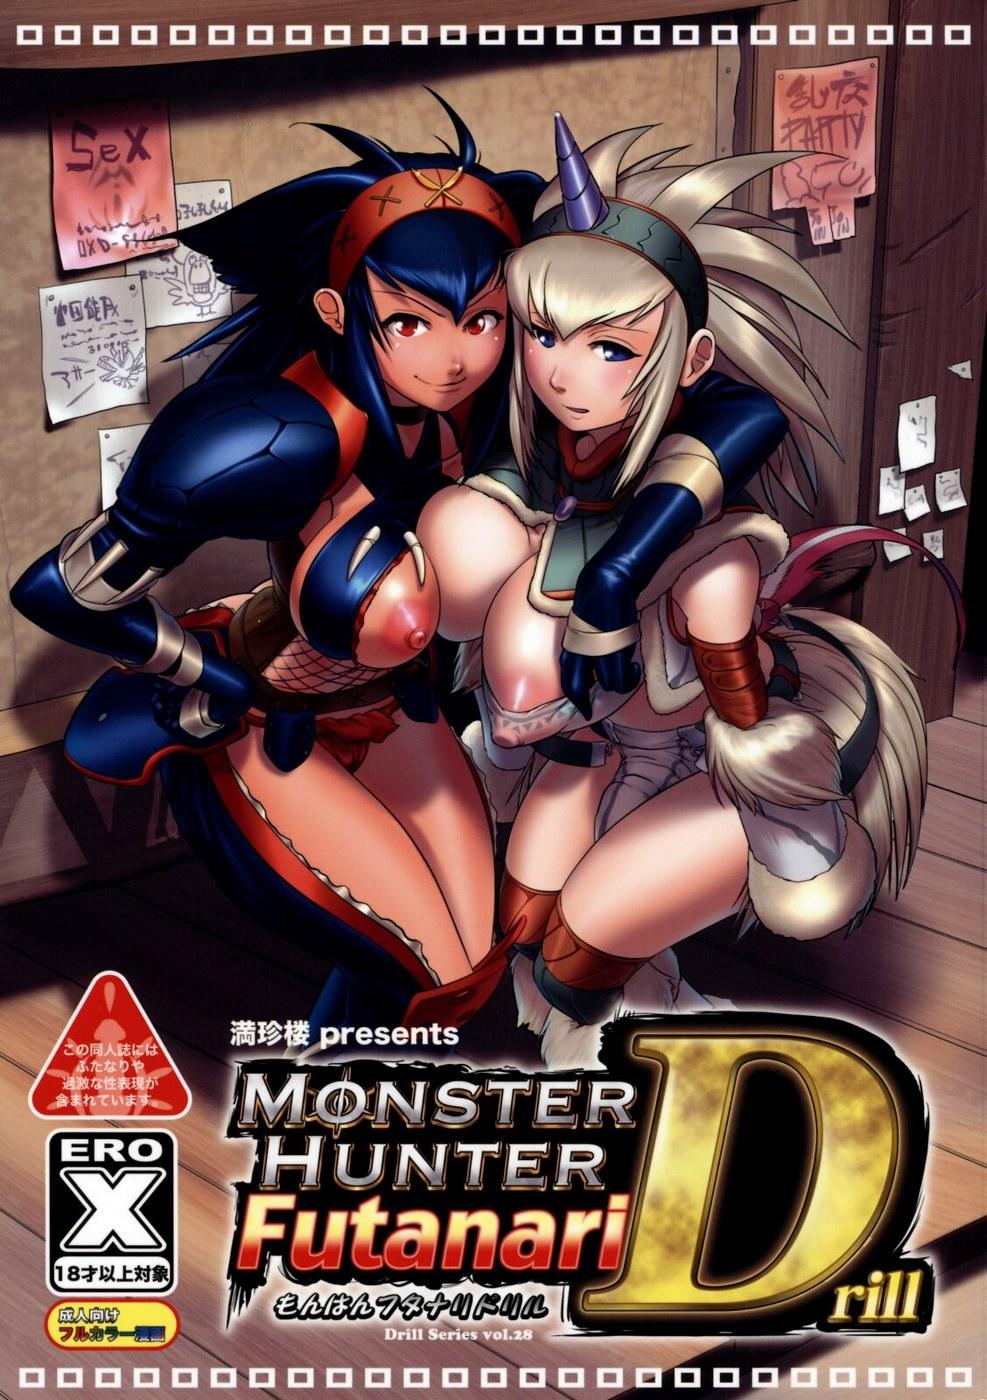 Porn Comics - Monster Hunter- Futanari Drill 1- Hentai porn comics 8 muses